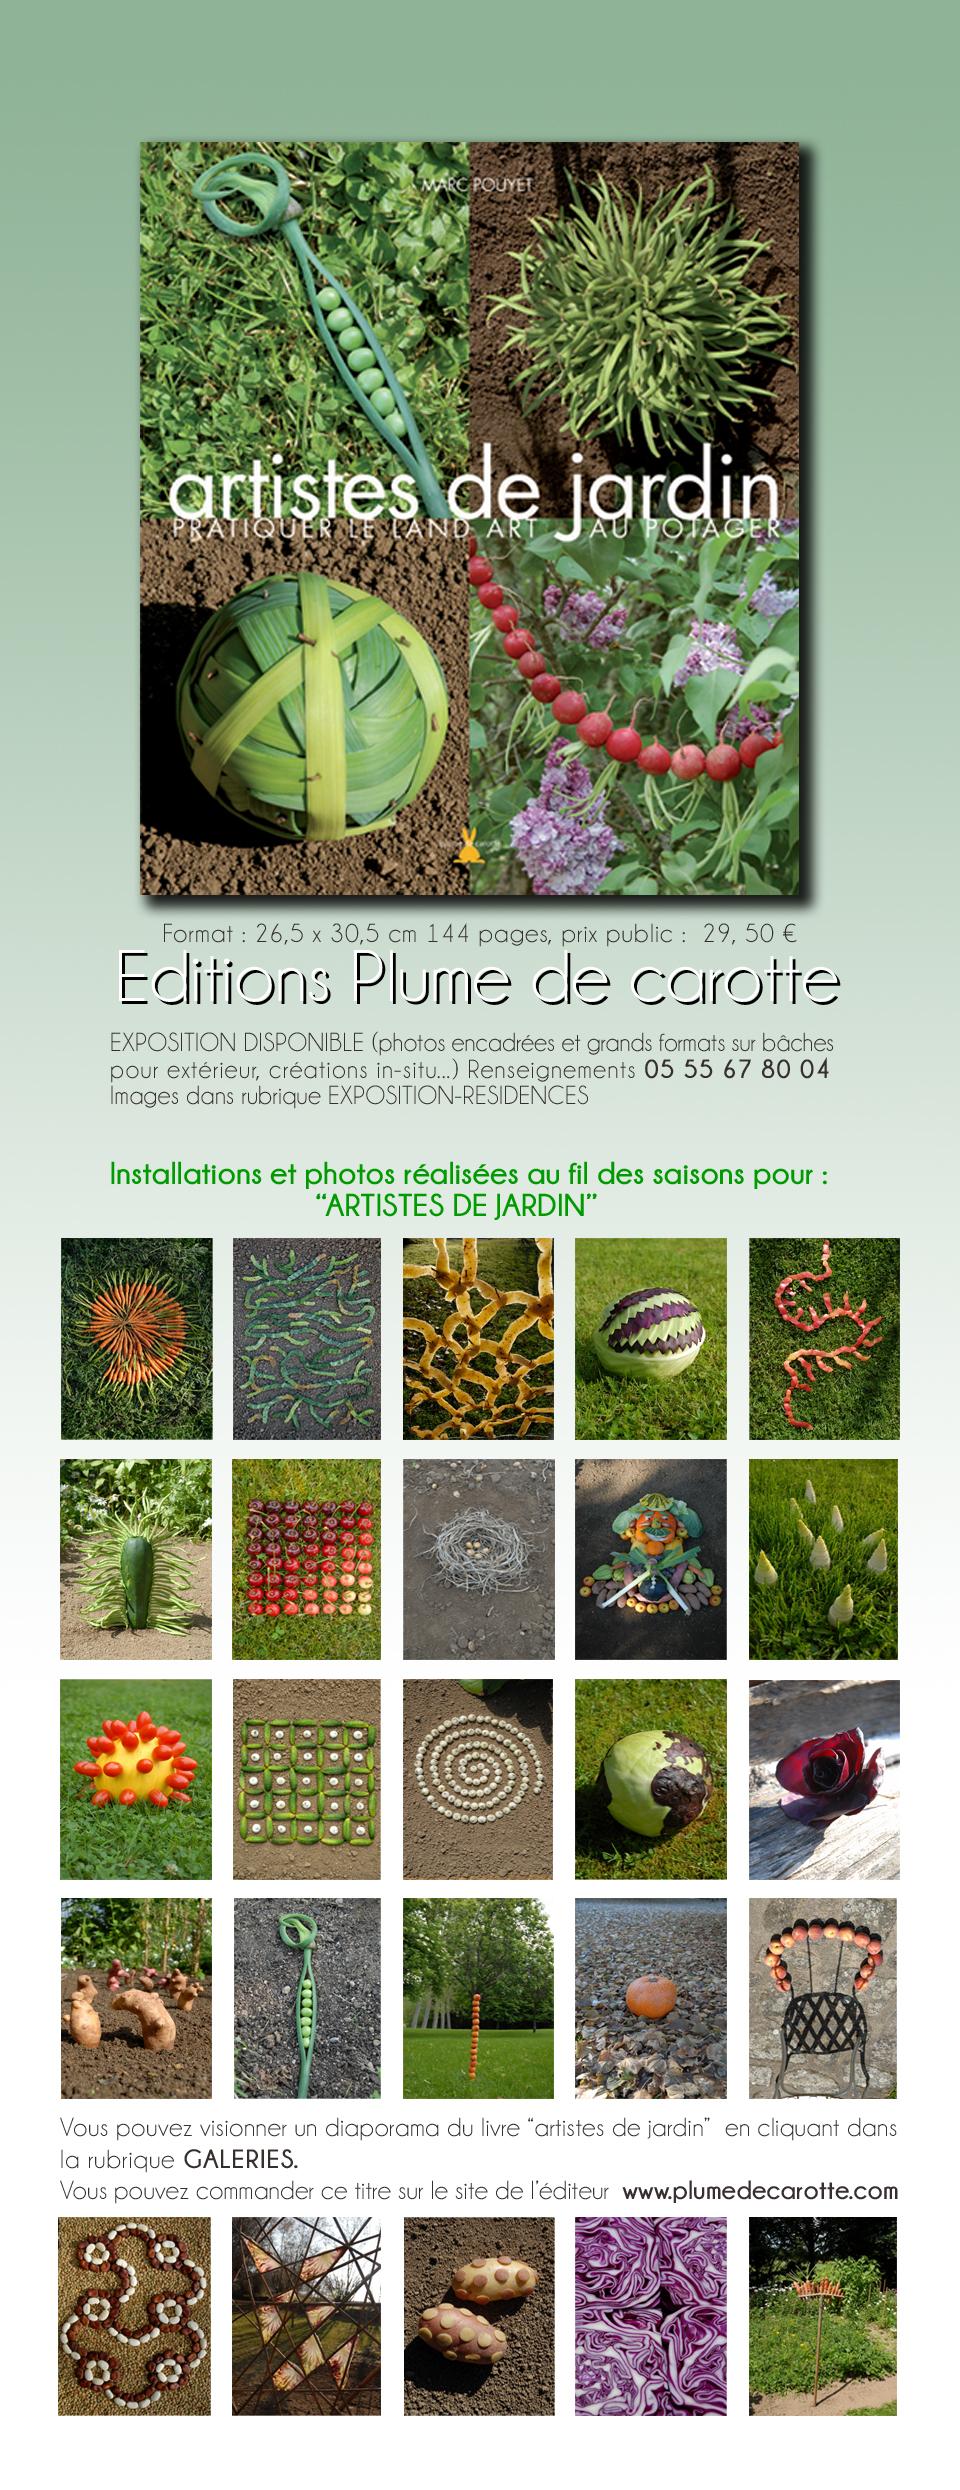 Le livre artistes de jardin 2 for Artistes de jardin